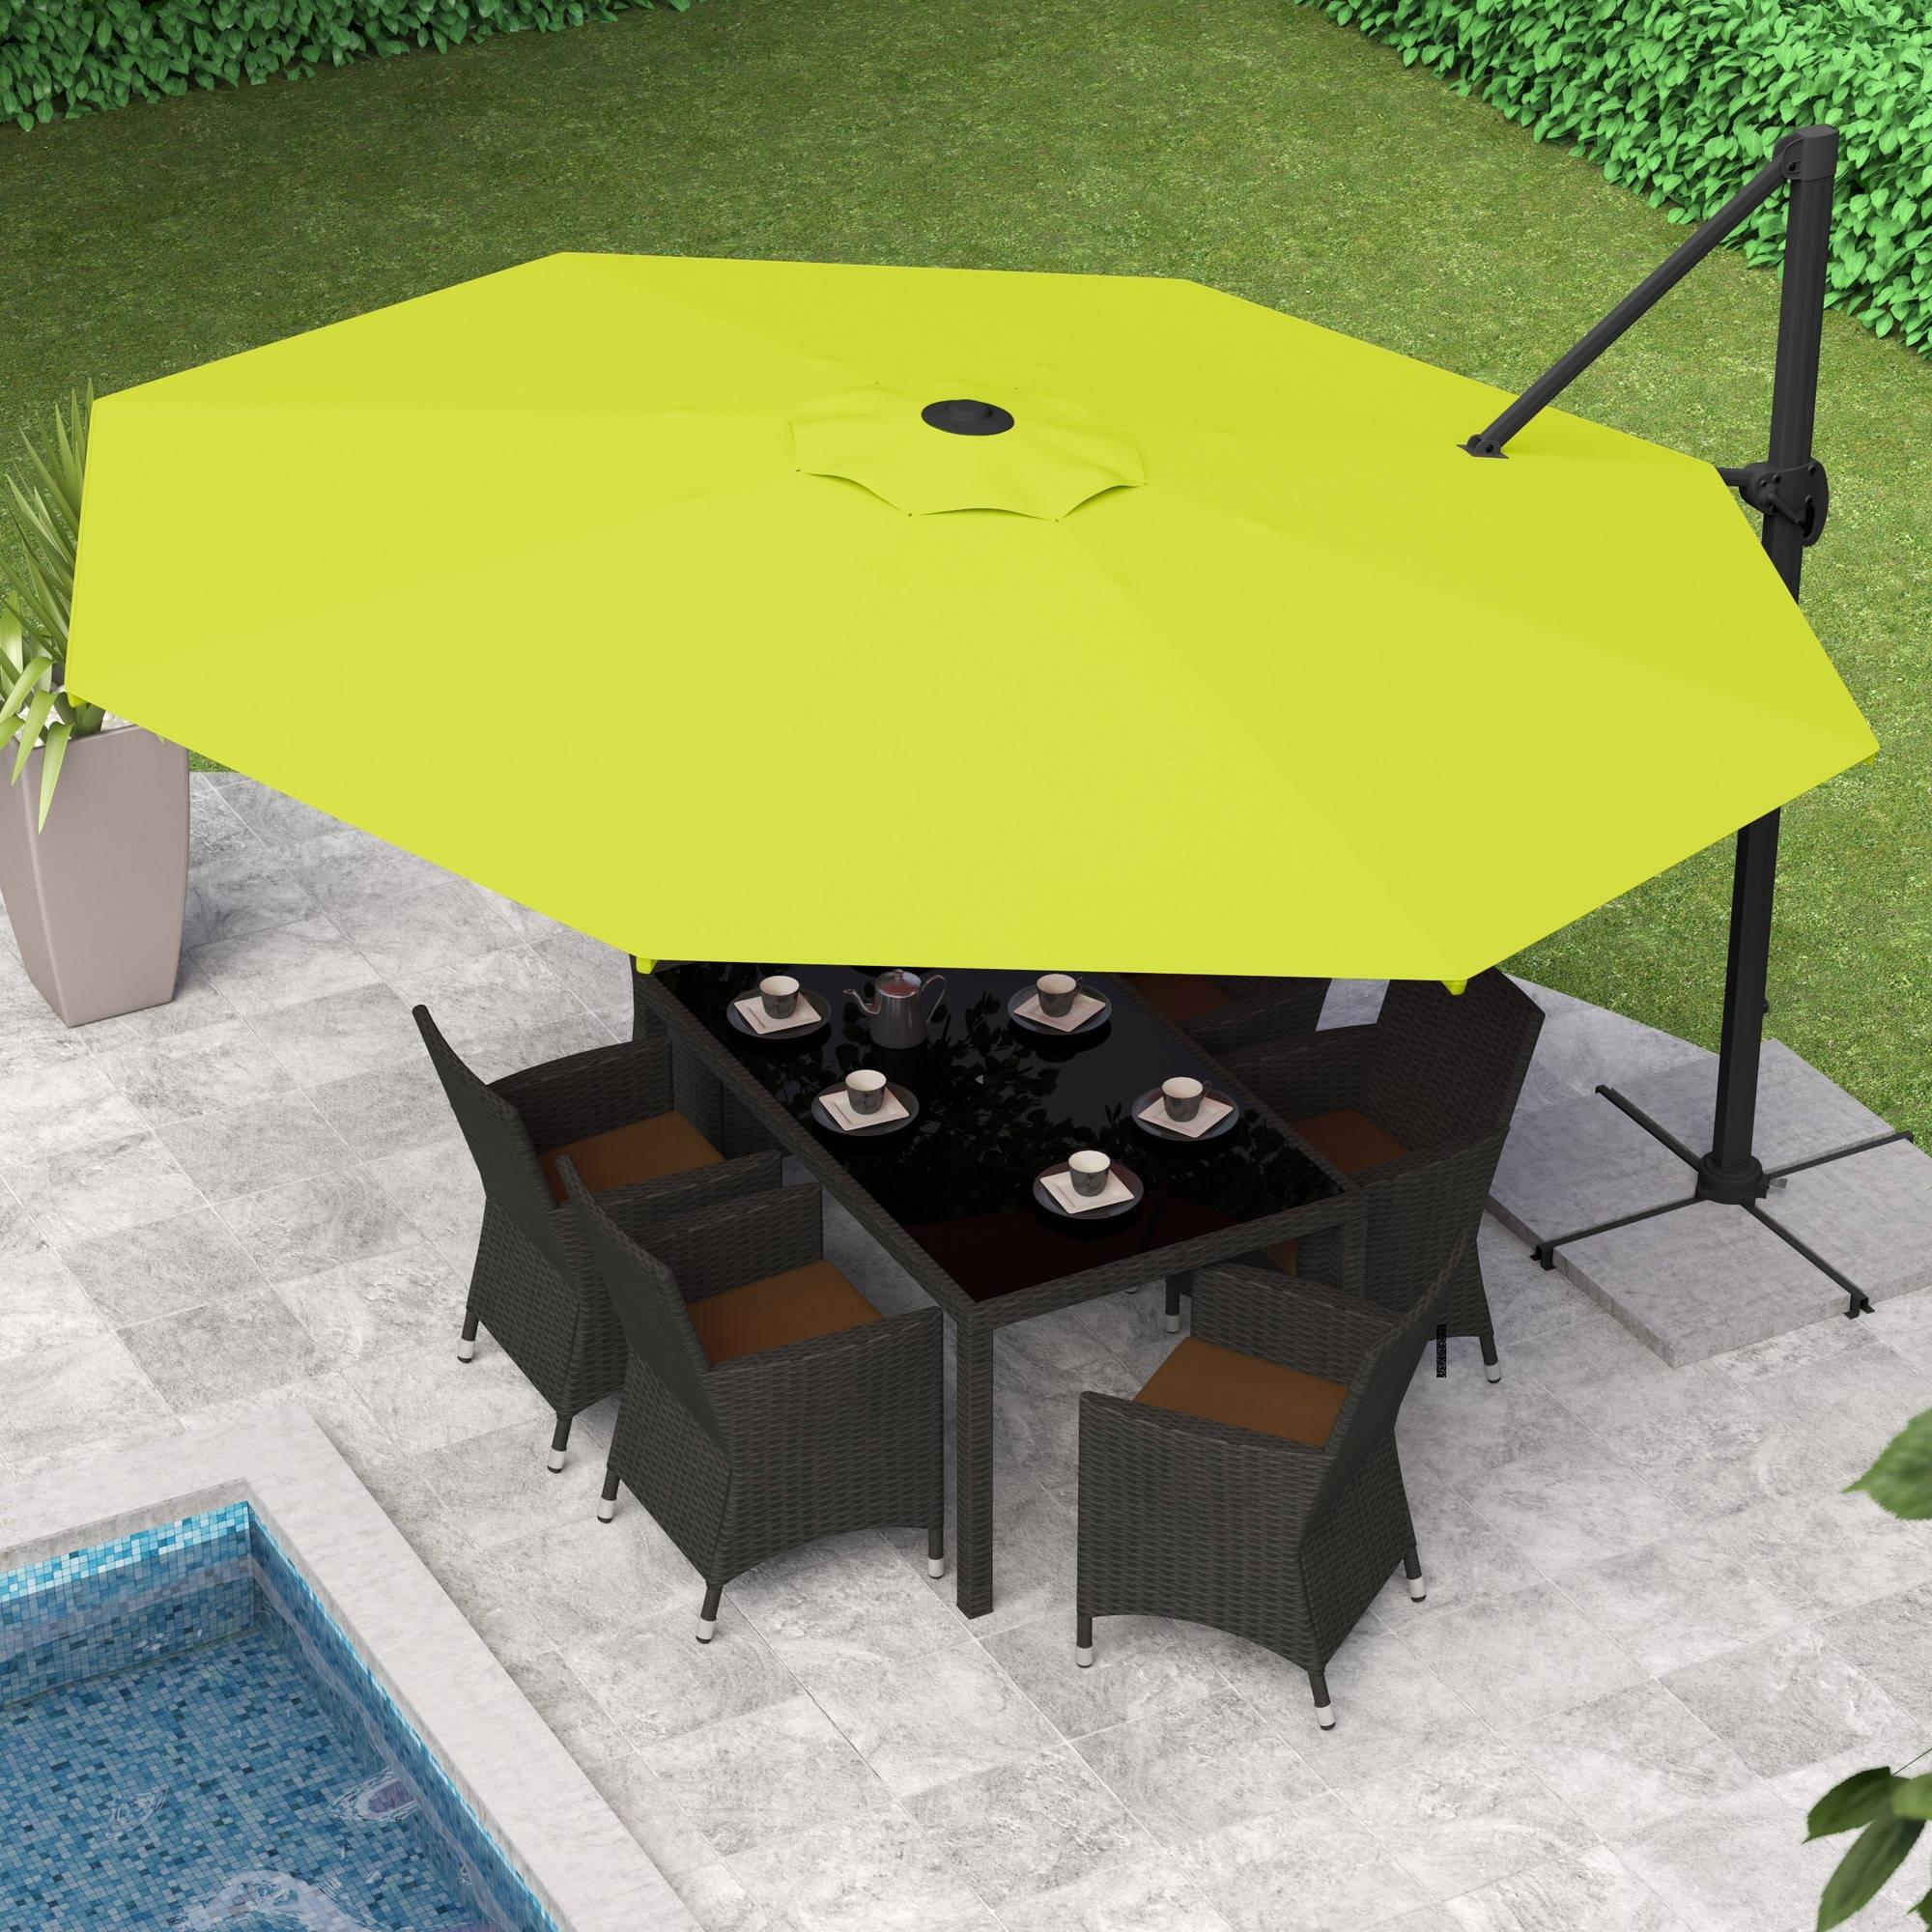 Deluxe Patio Umbrellas Throughout Current Corliving Deluxe Offset Patio Umbrella – Walmart (View 7 of 20)